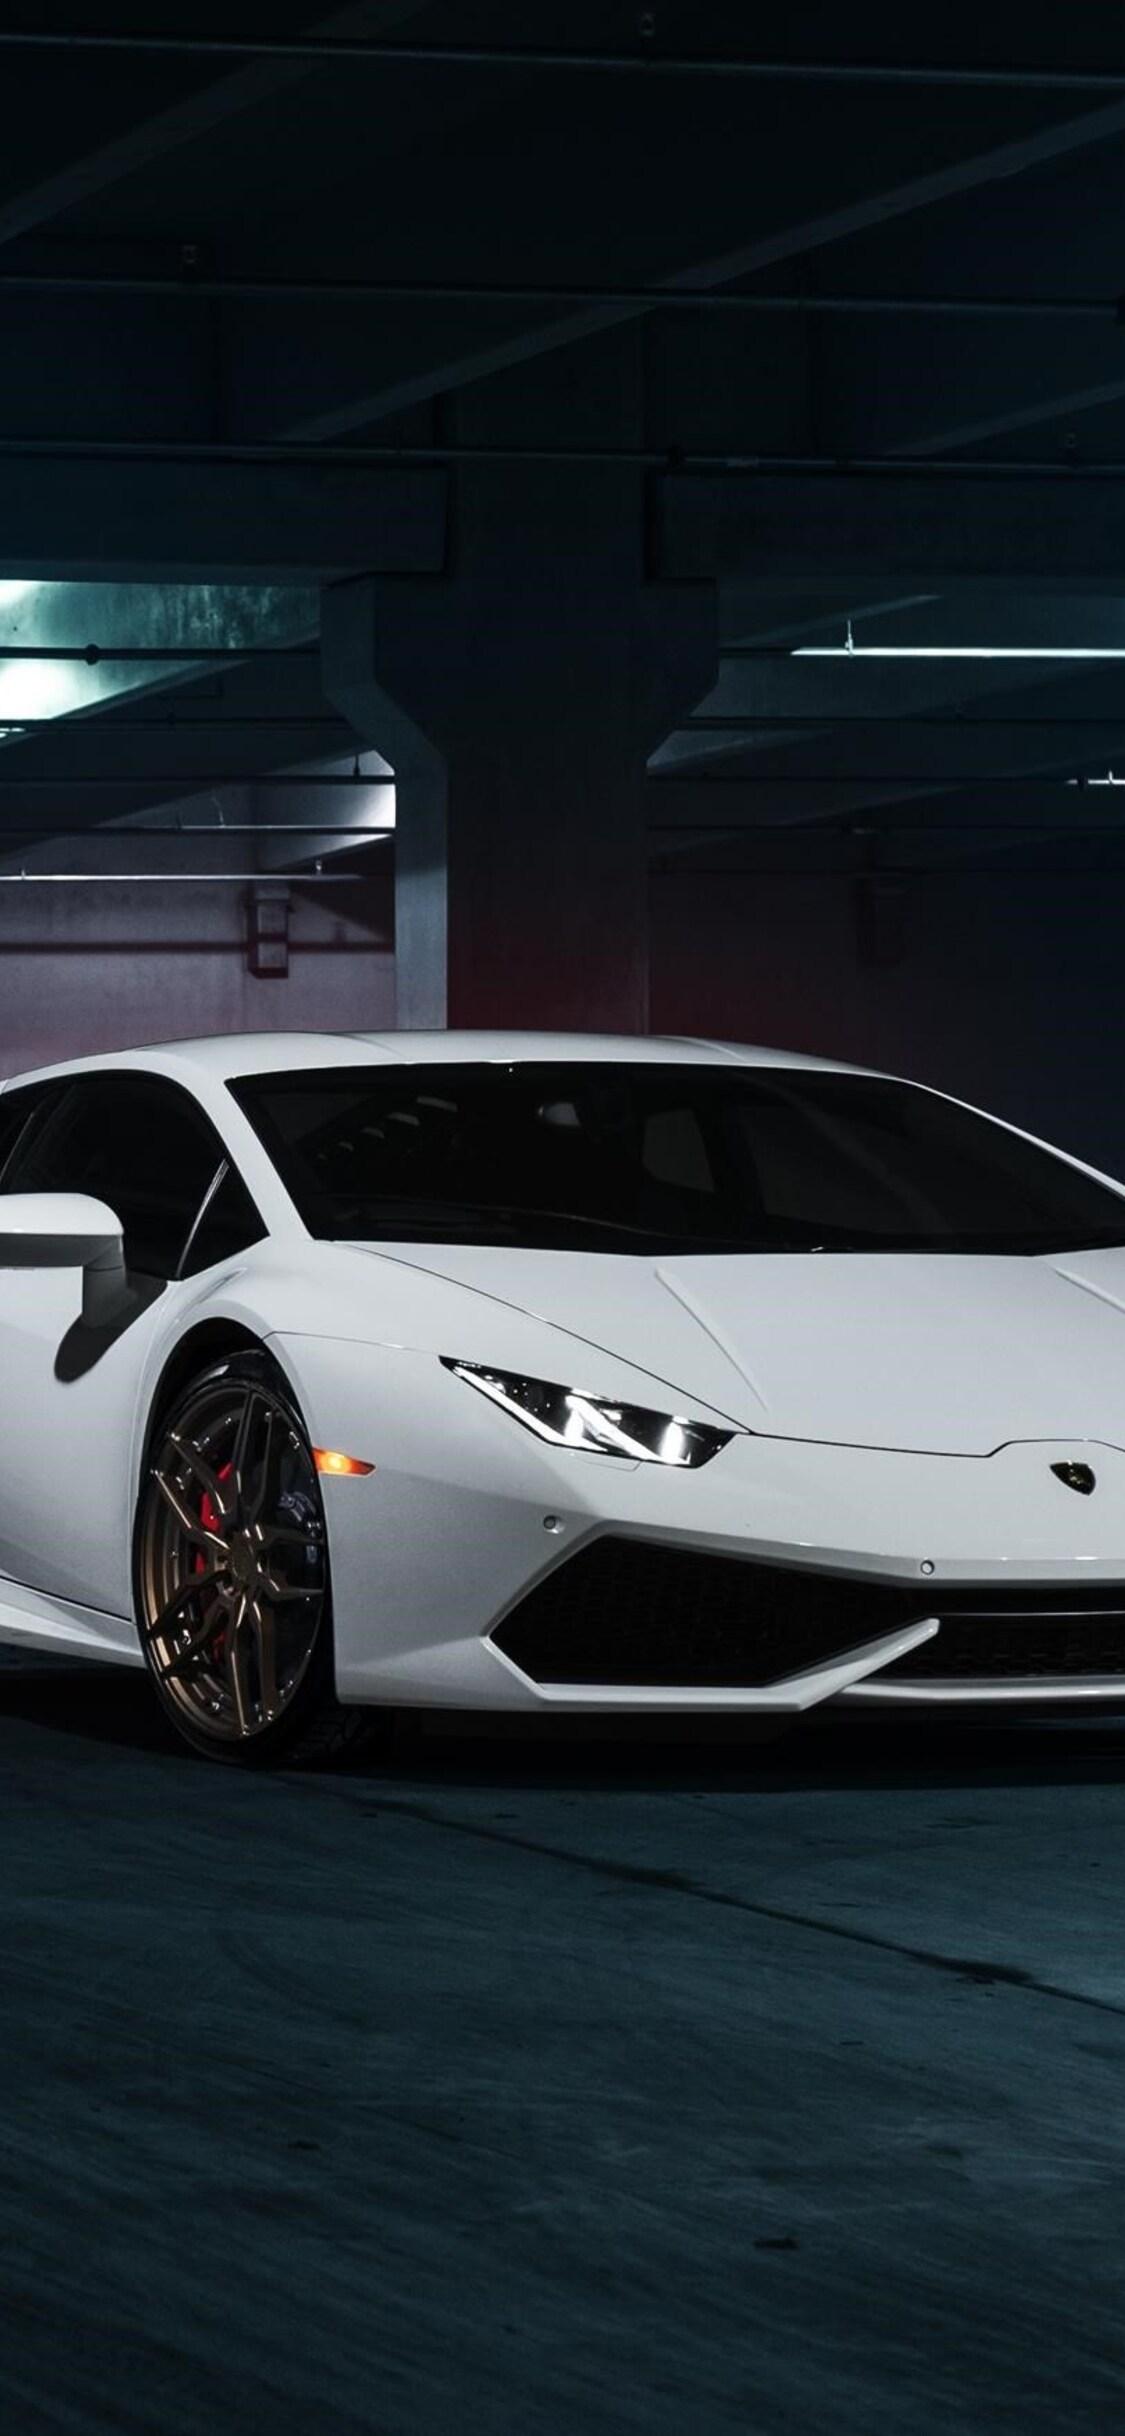 1125x2436 Lamborghini Huracan 2 Iphone XIphone 10 HD 4k Wallpapers